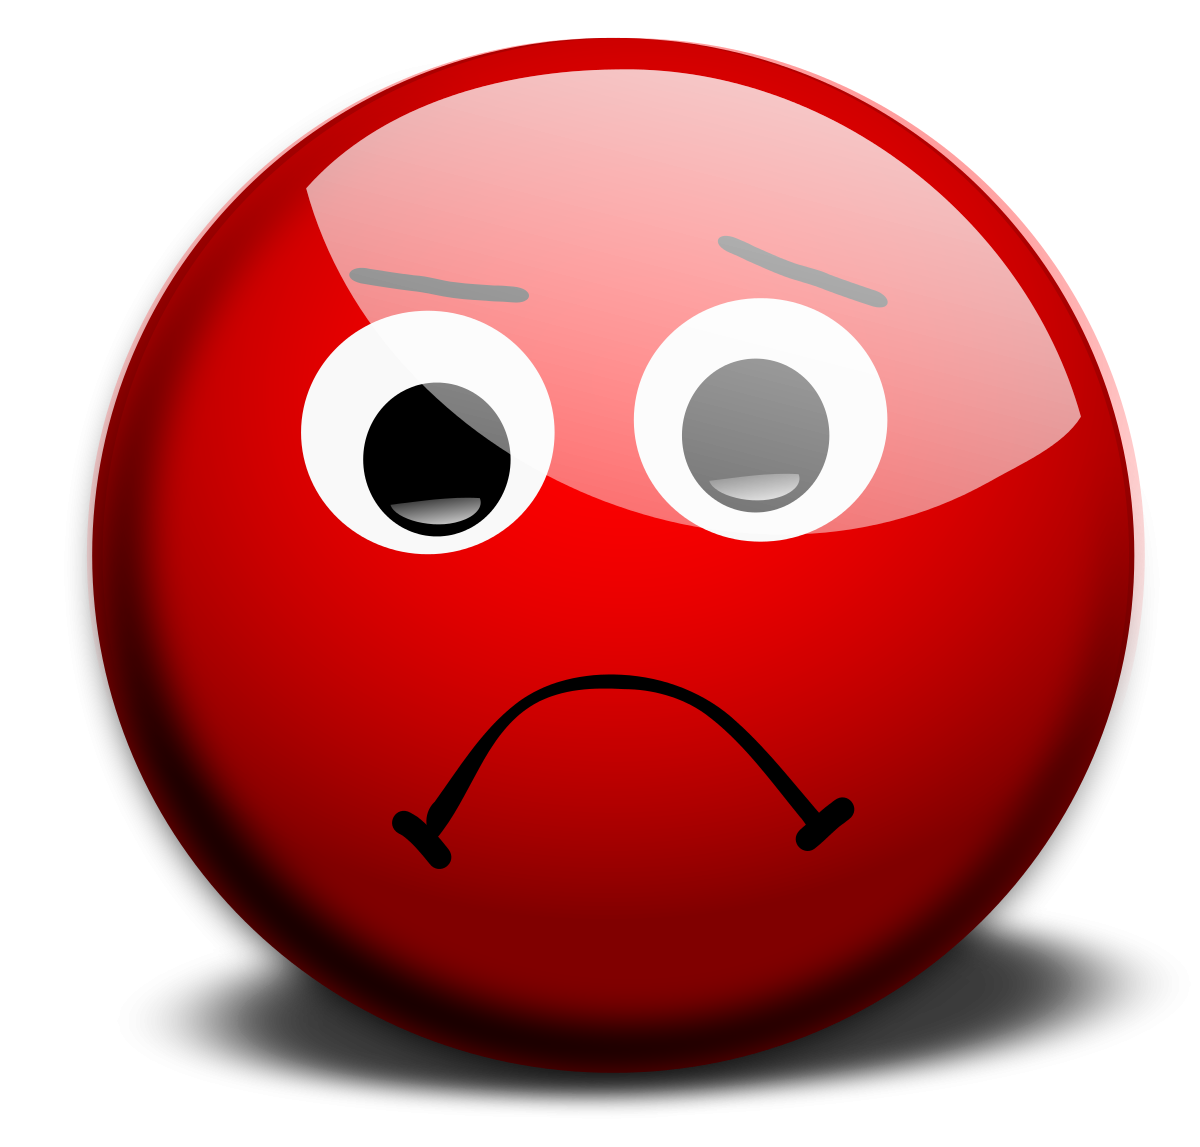 A sad face clipart